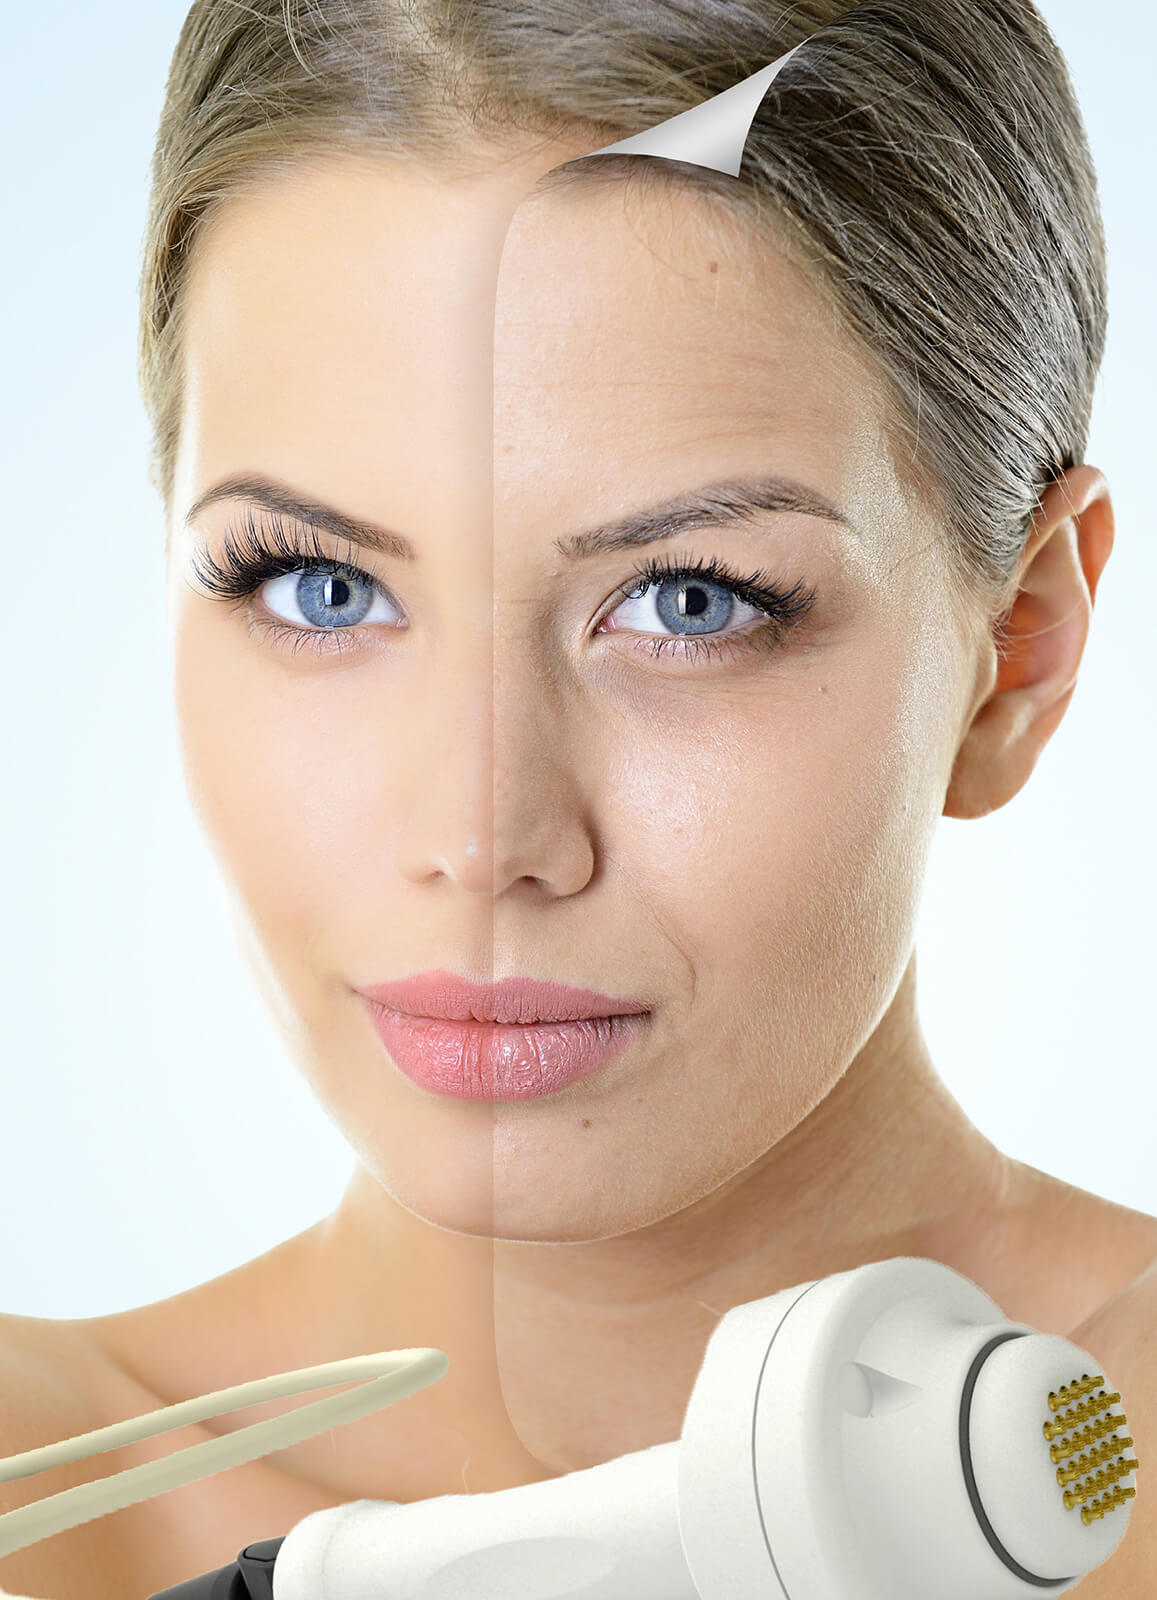 Ghea-Cosmetici-Mirati-Fitosterolina-Viso